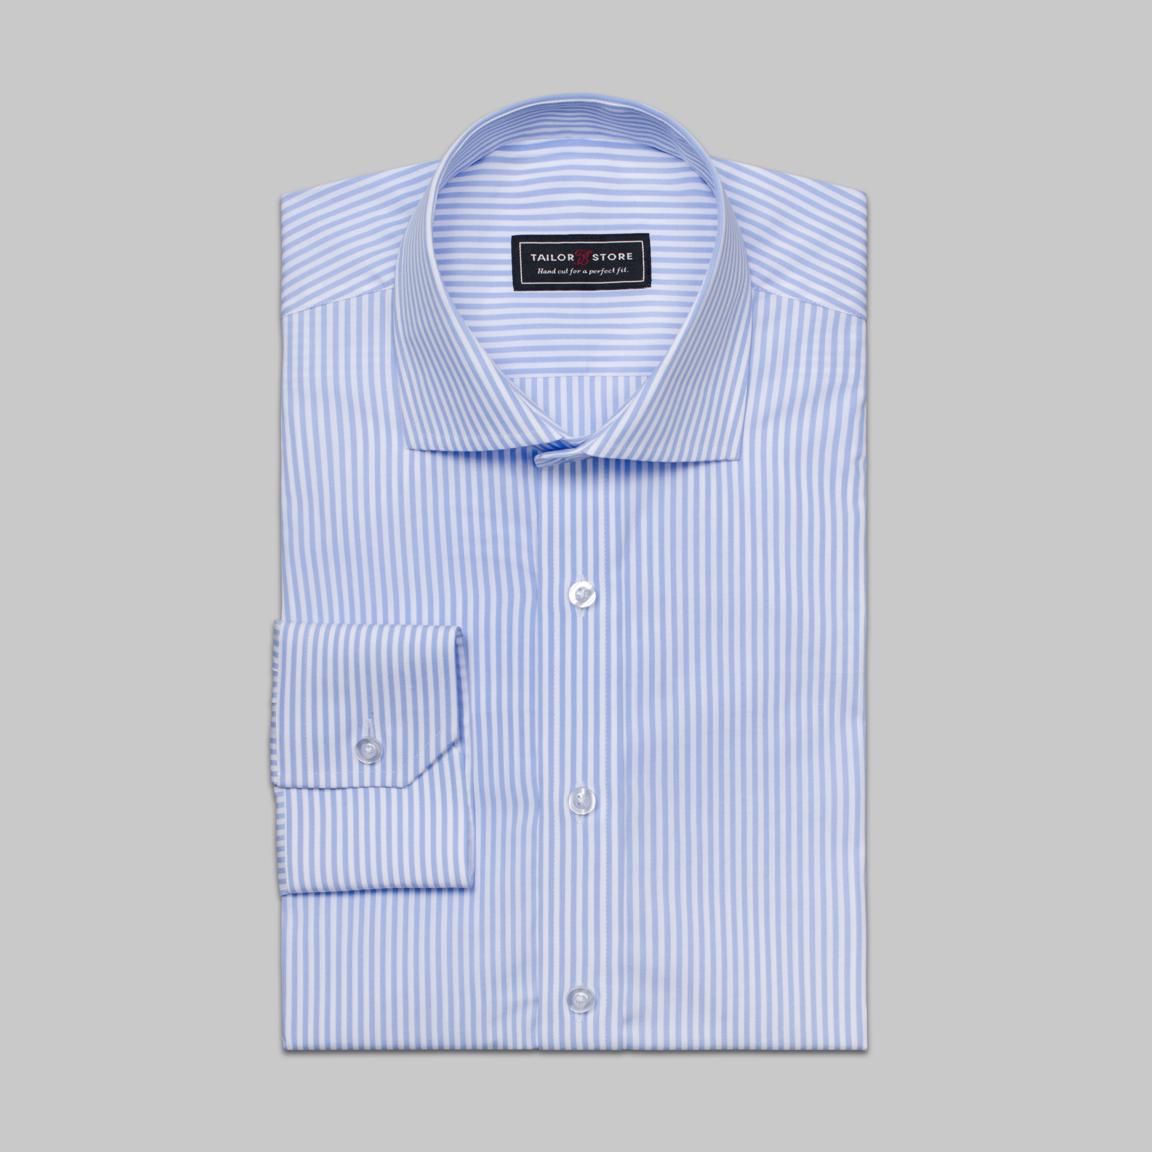 Striped dress shirt light blue/white<br>